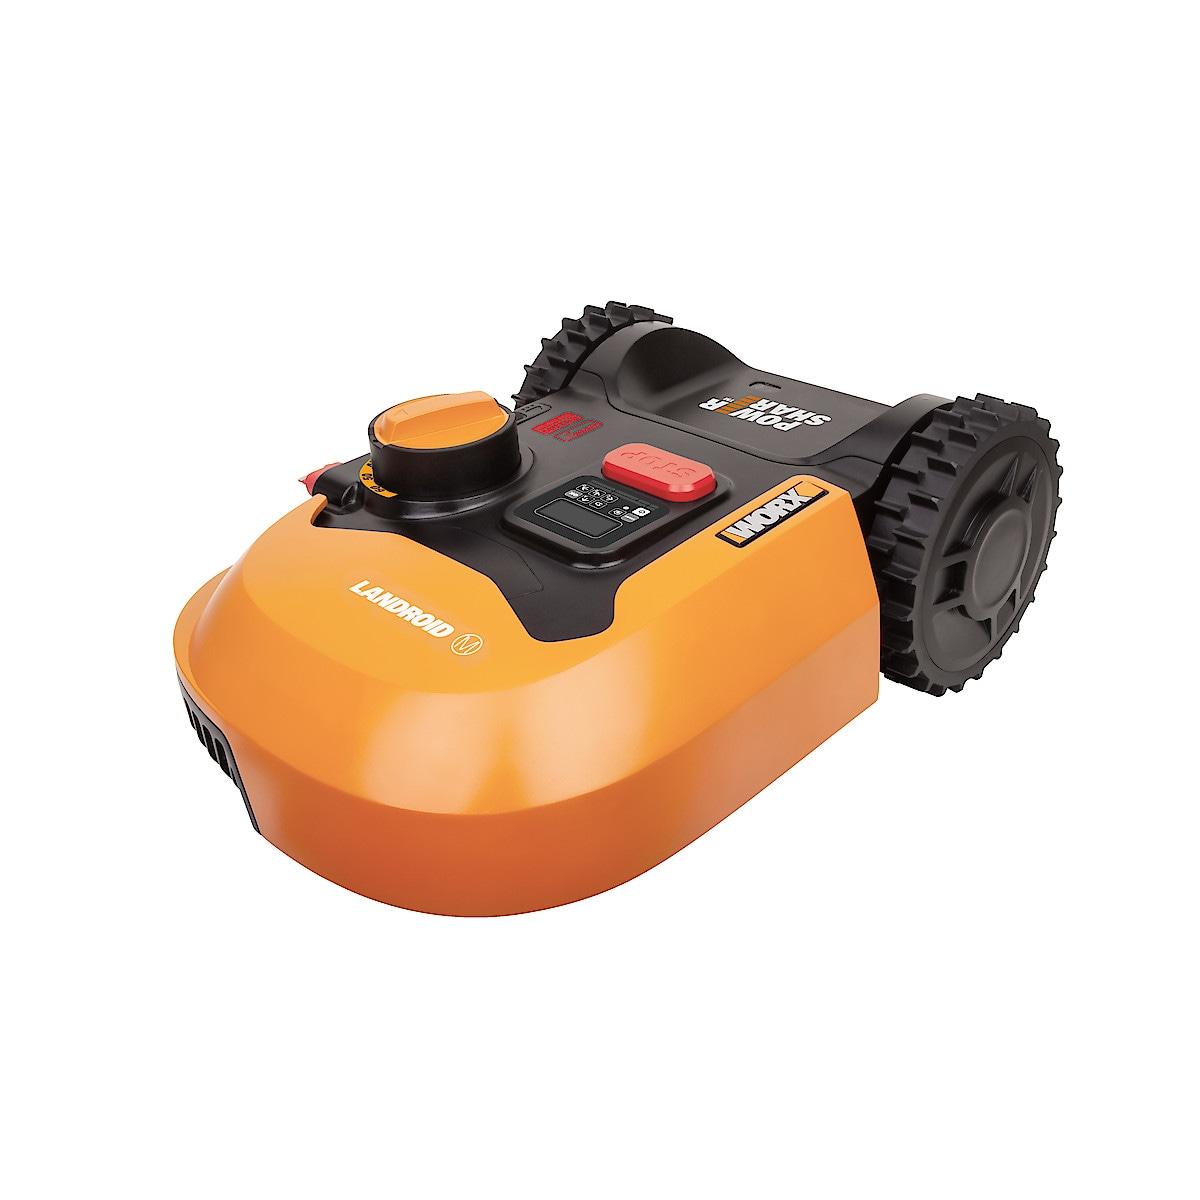 Robotgräsklippare Worx Landroid M700 WR142E